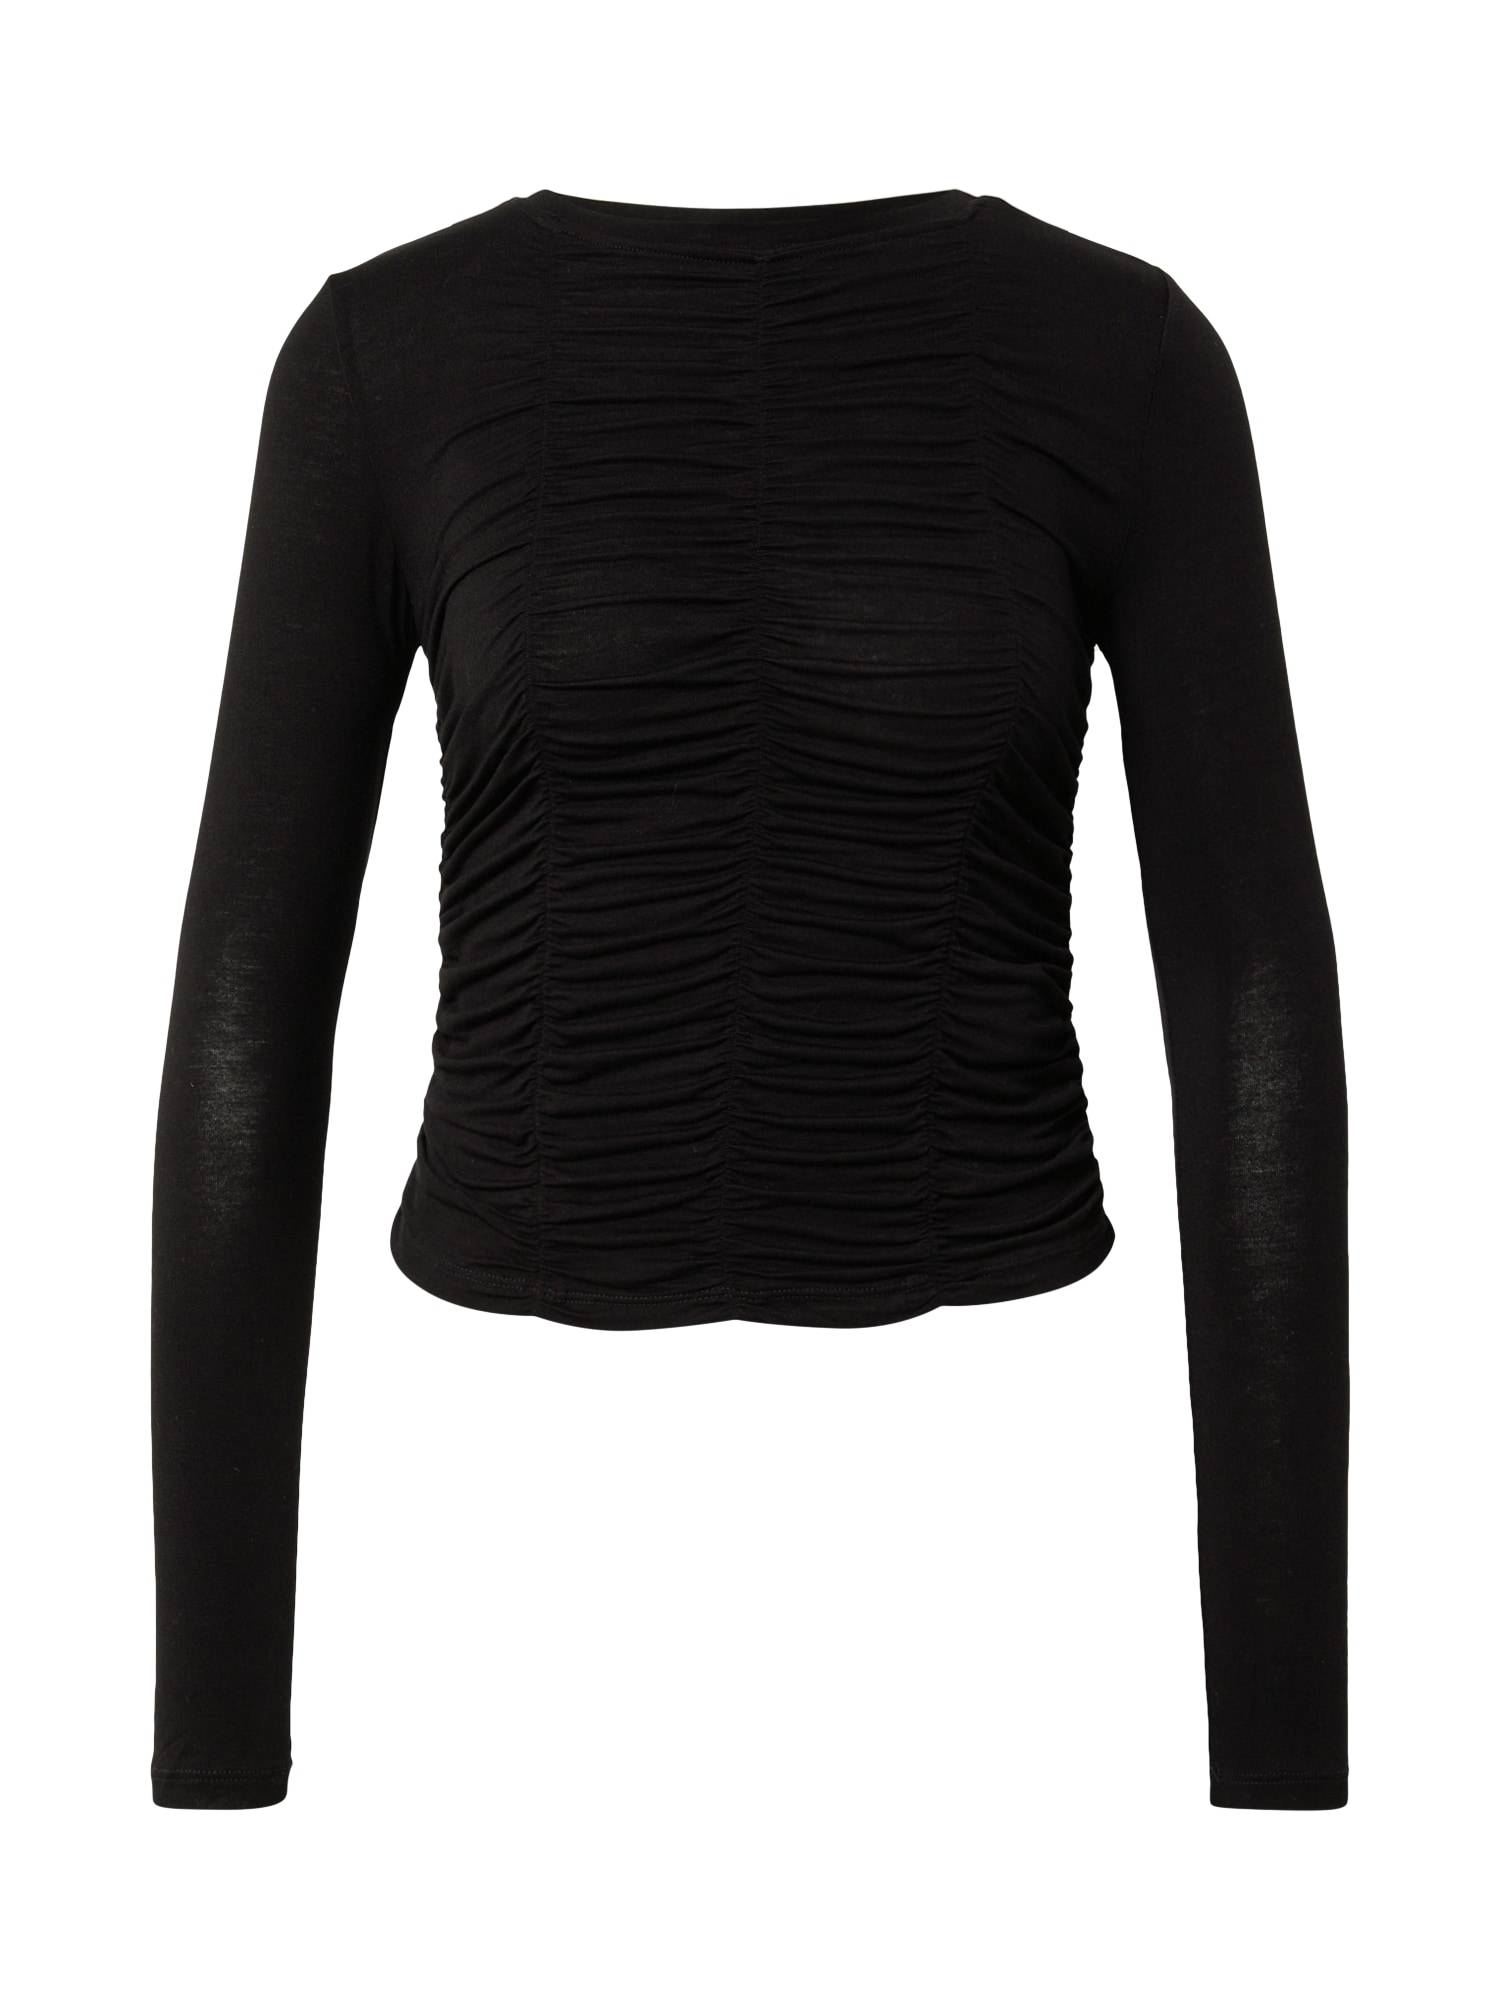 Gina Tricot Haut 'Catti'  - Noir - Taille: L - female